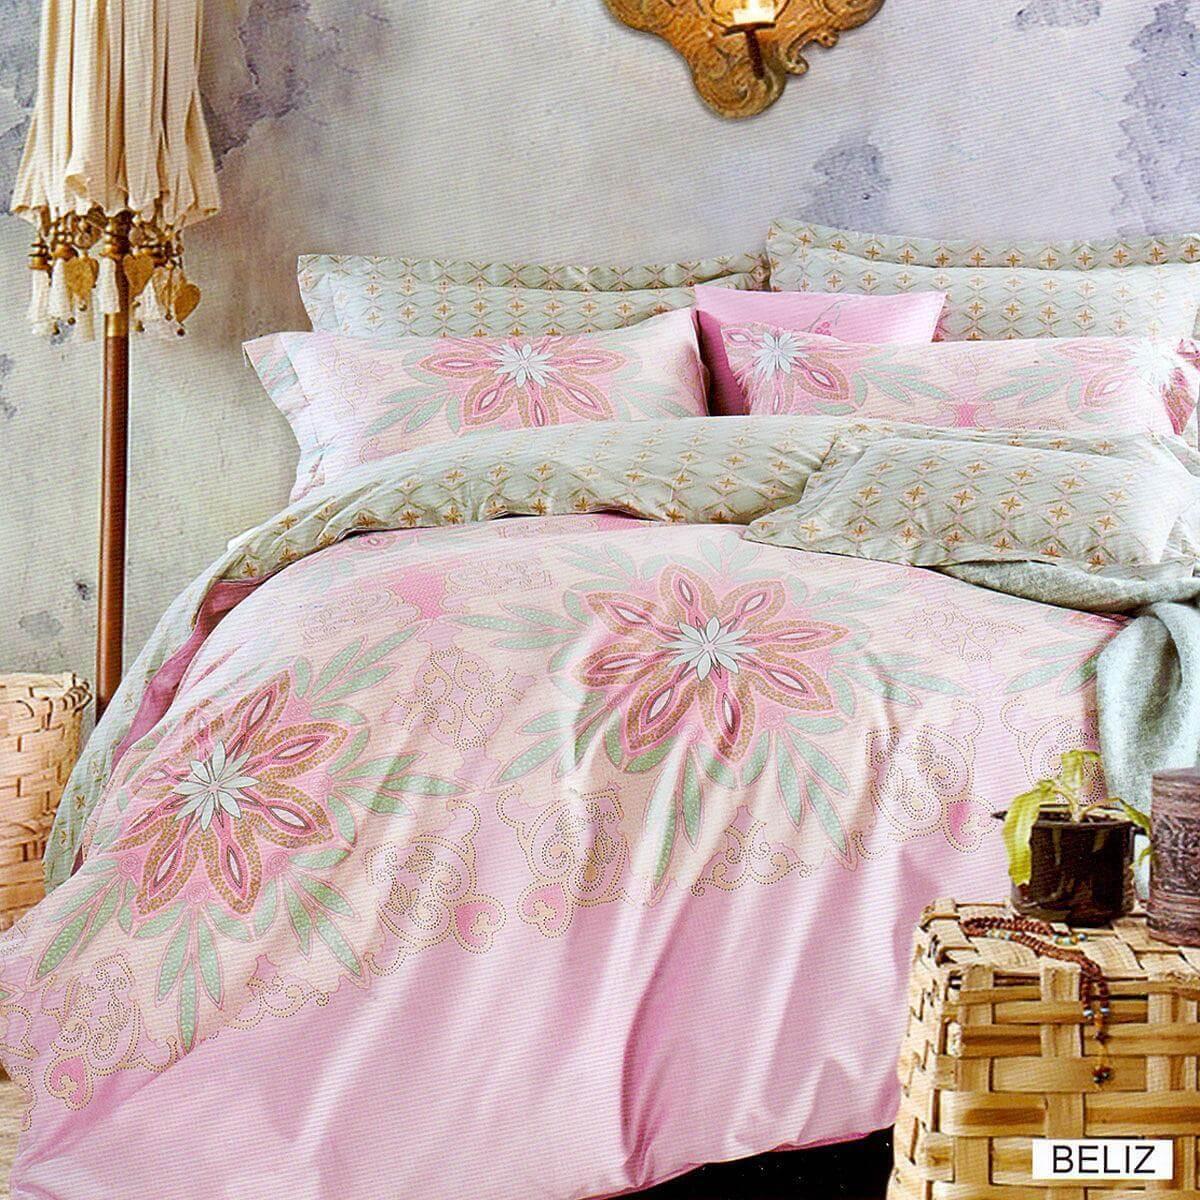 светло-розовый, серый